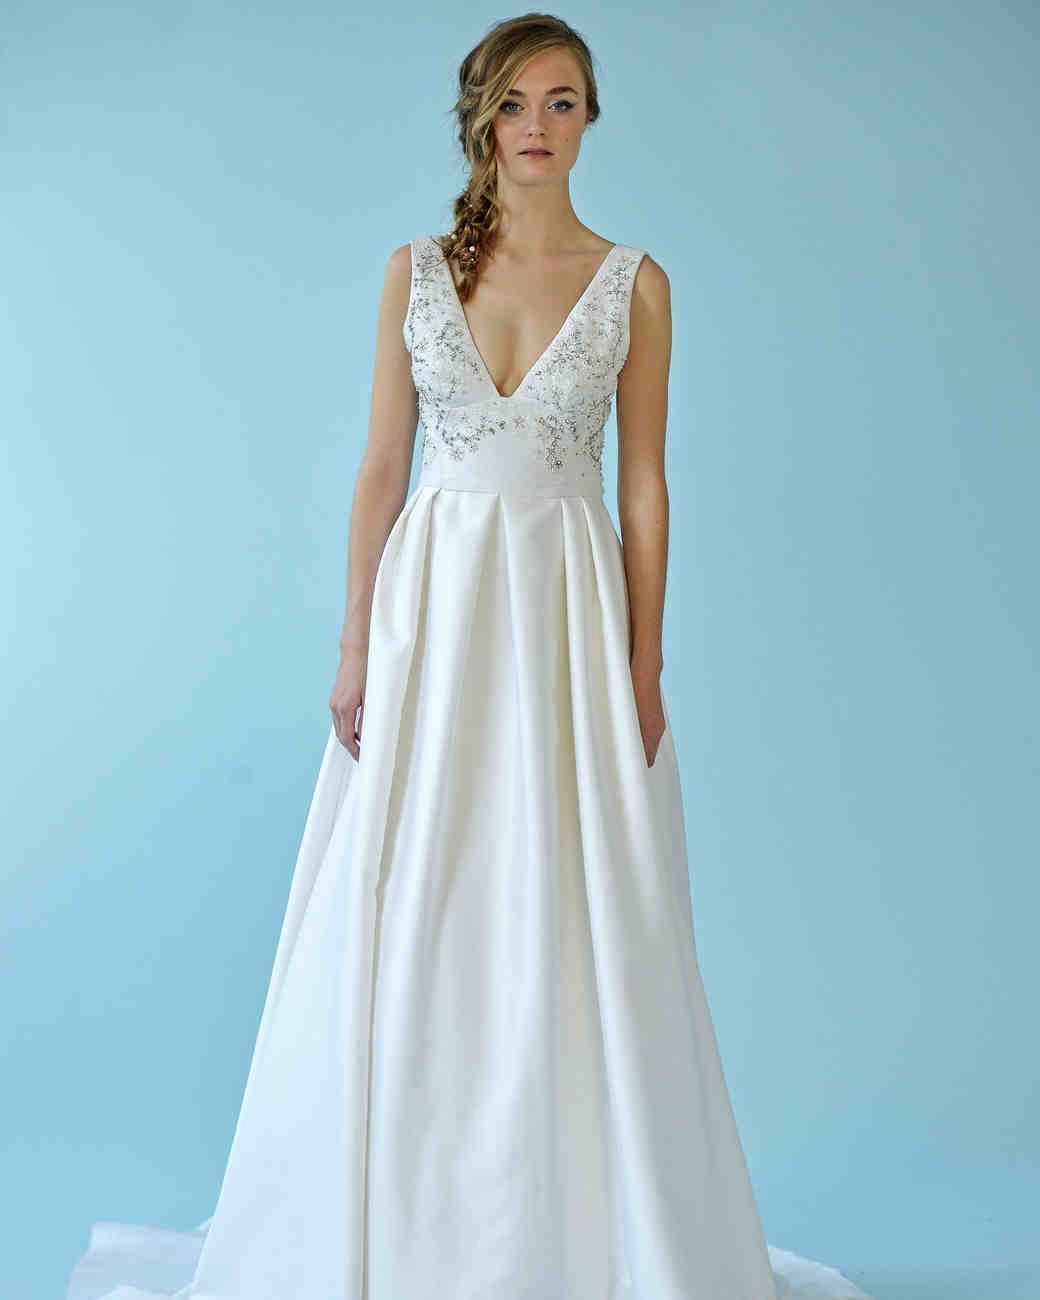 Lela Rose Fall 2015 Bridal Show | Martha Stewart Weddings